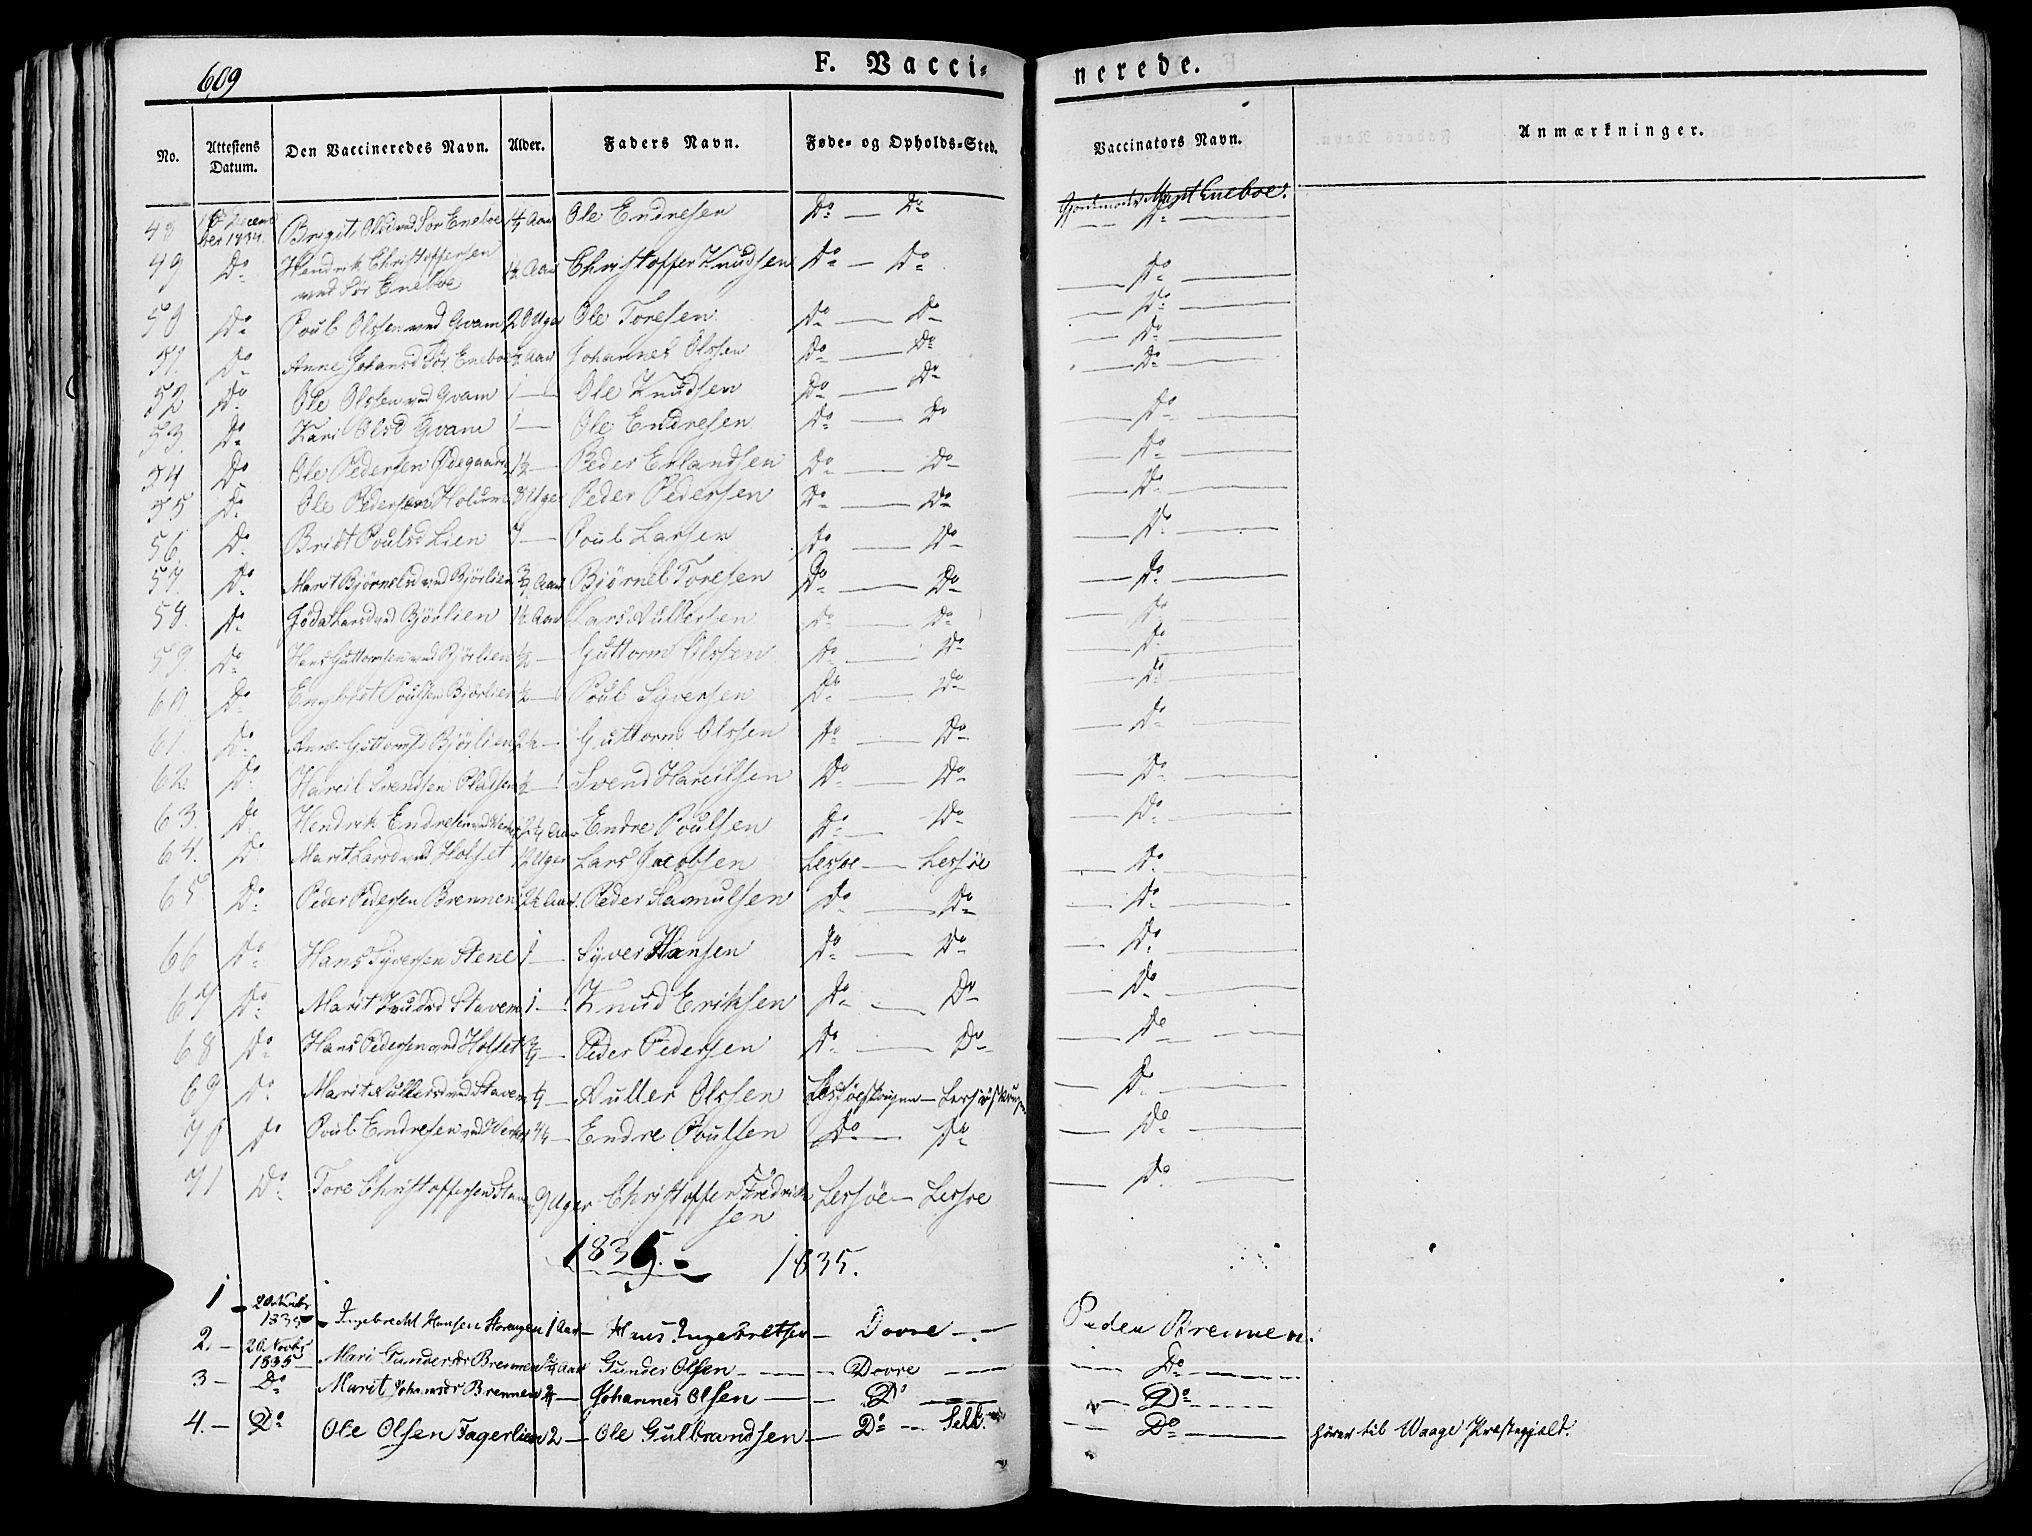 SAH, Lesja prestekontor, Ministerialbok nr. 5, 1830-1842, s. 609